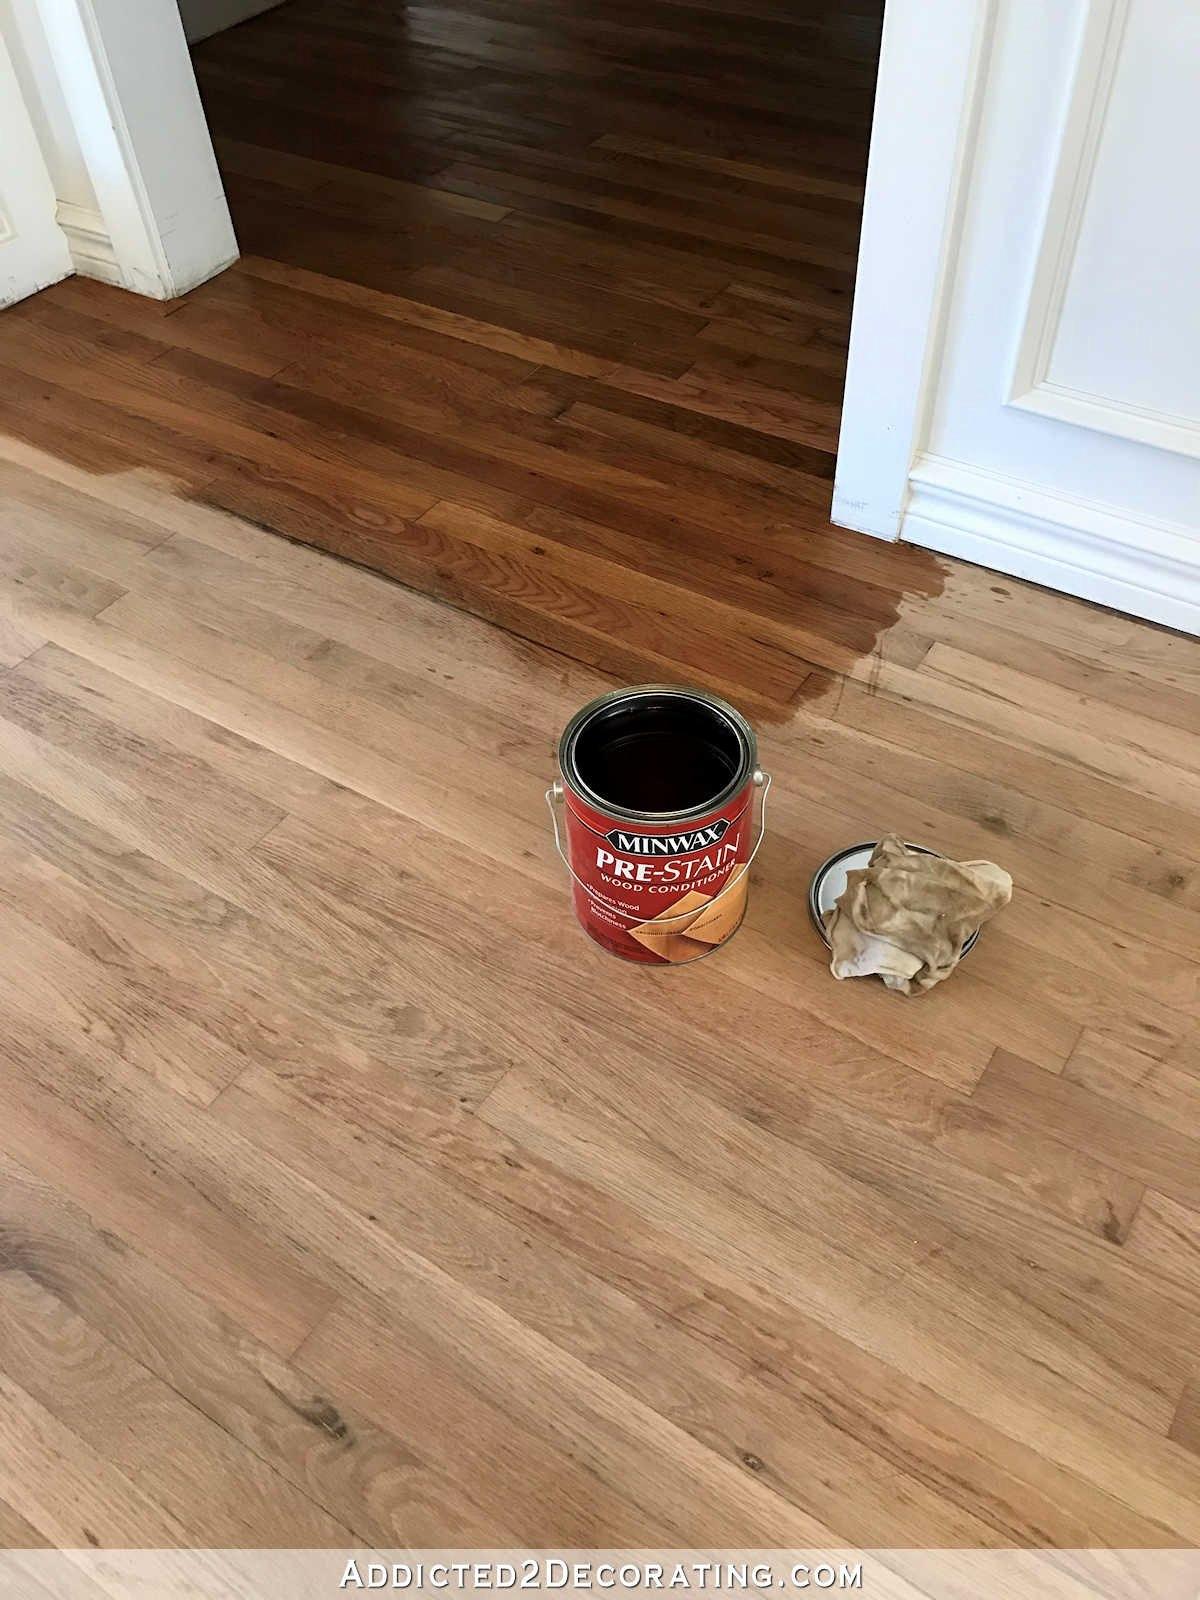 hardwood floors and grey walls of hardwood floors for dogs hardwood floors los angeles intended for hardwood floors for dogs hardwood floors los angeles podemosleganes